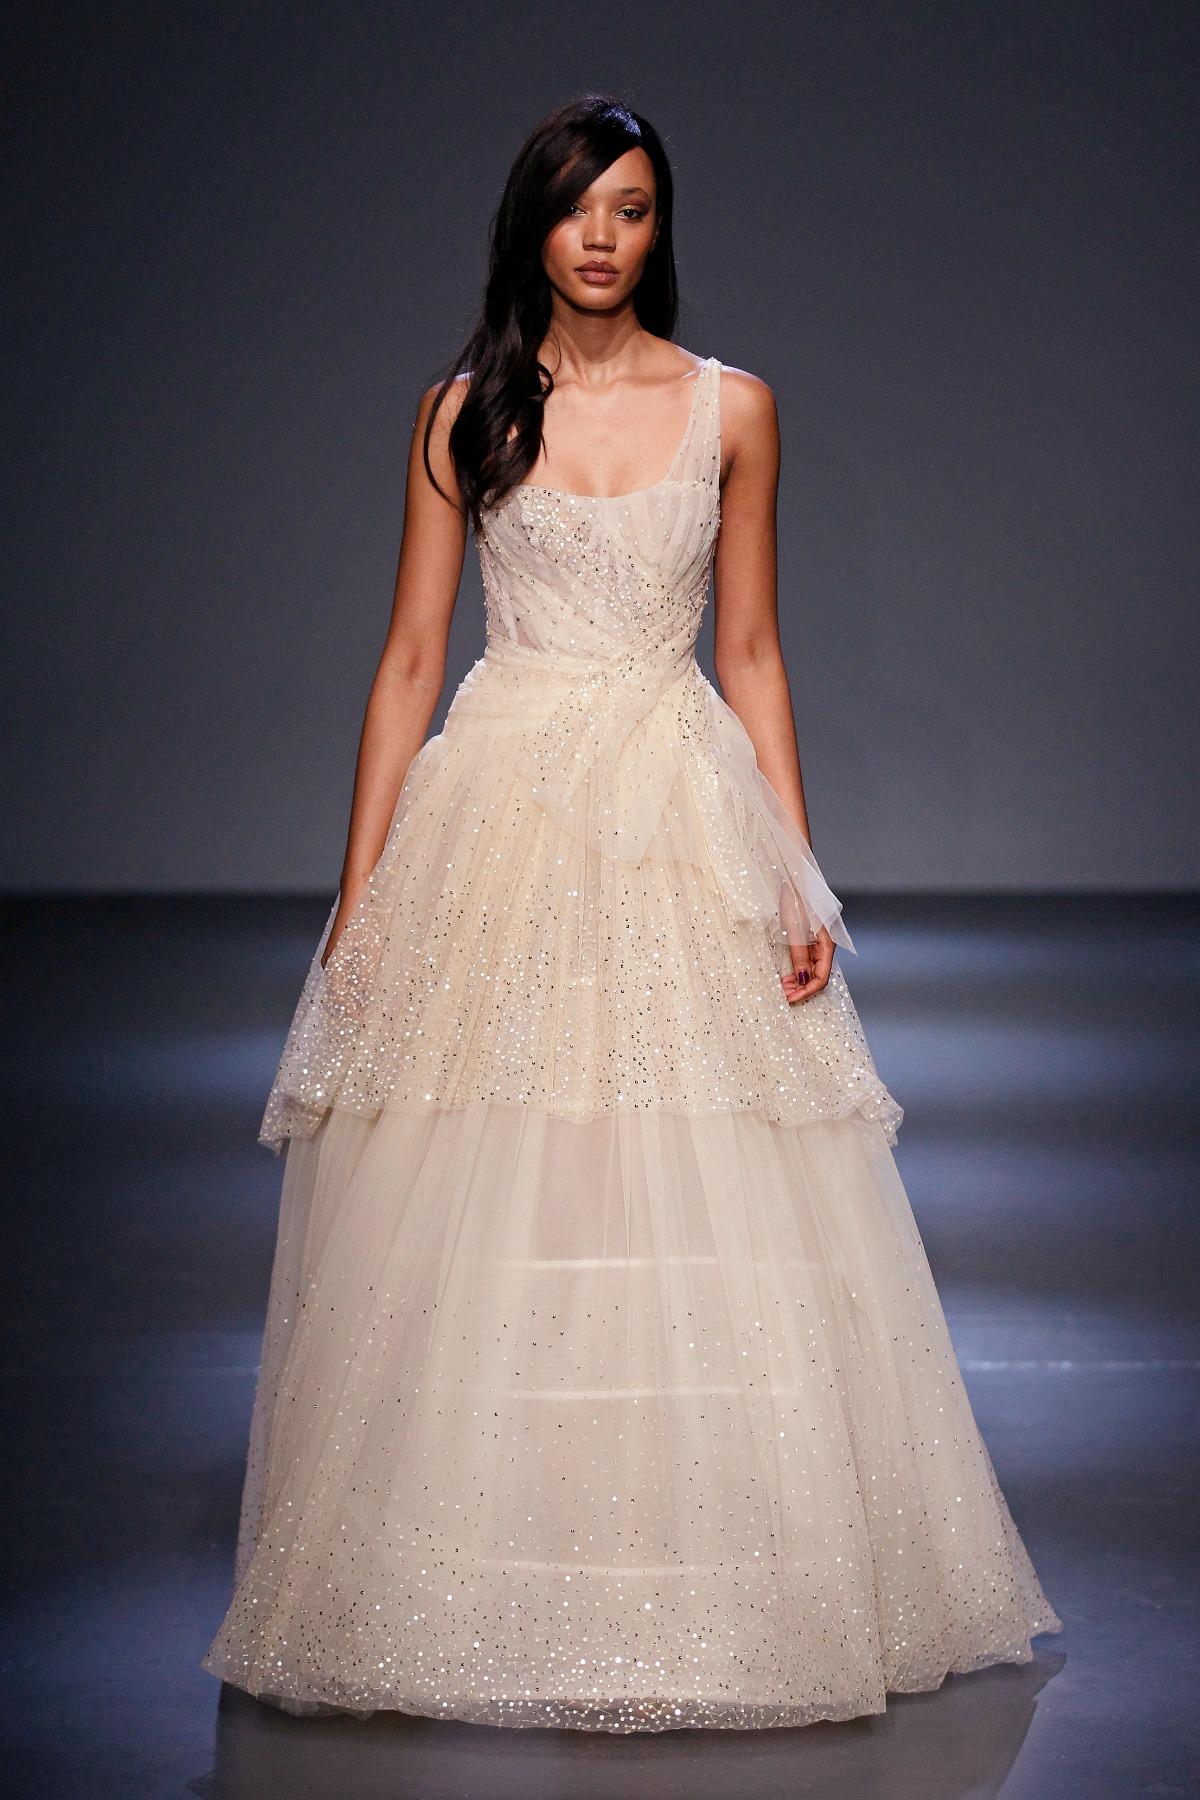 Pamella Roland Fall 2018 Runway I Princess Gown #NYFW #WinterFashion